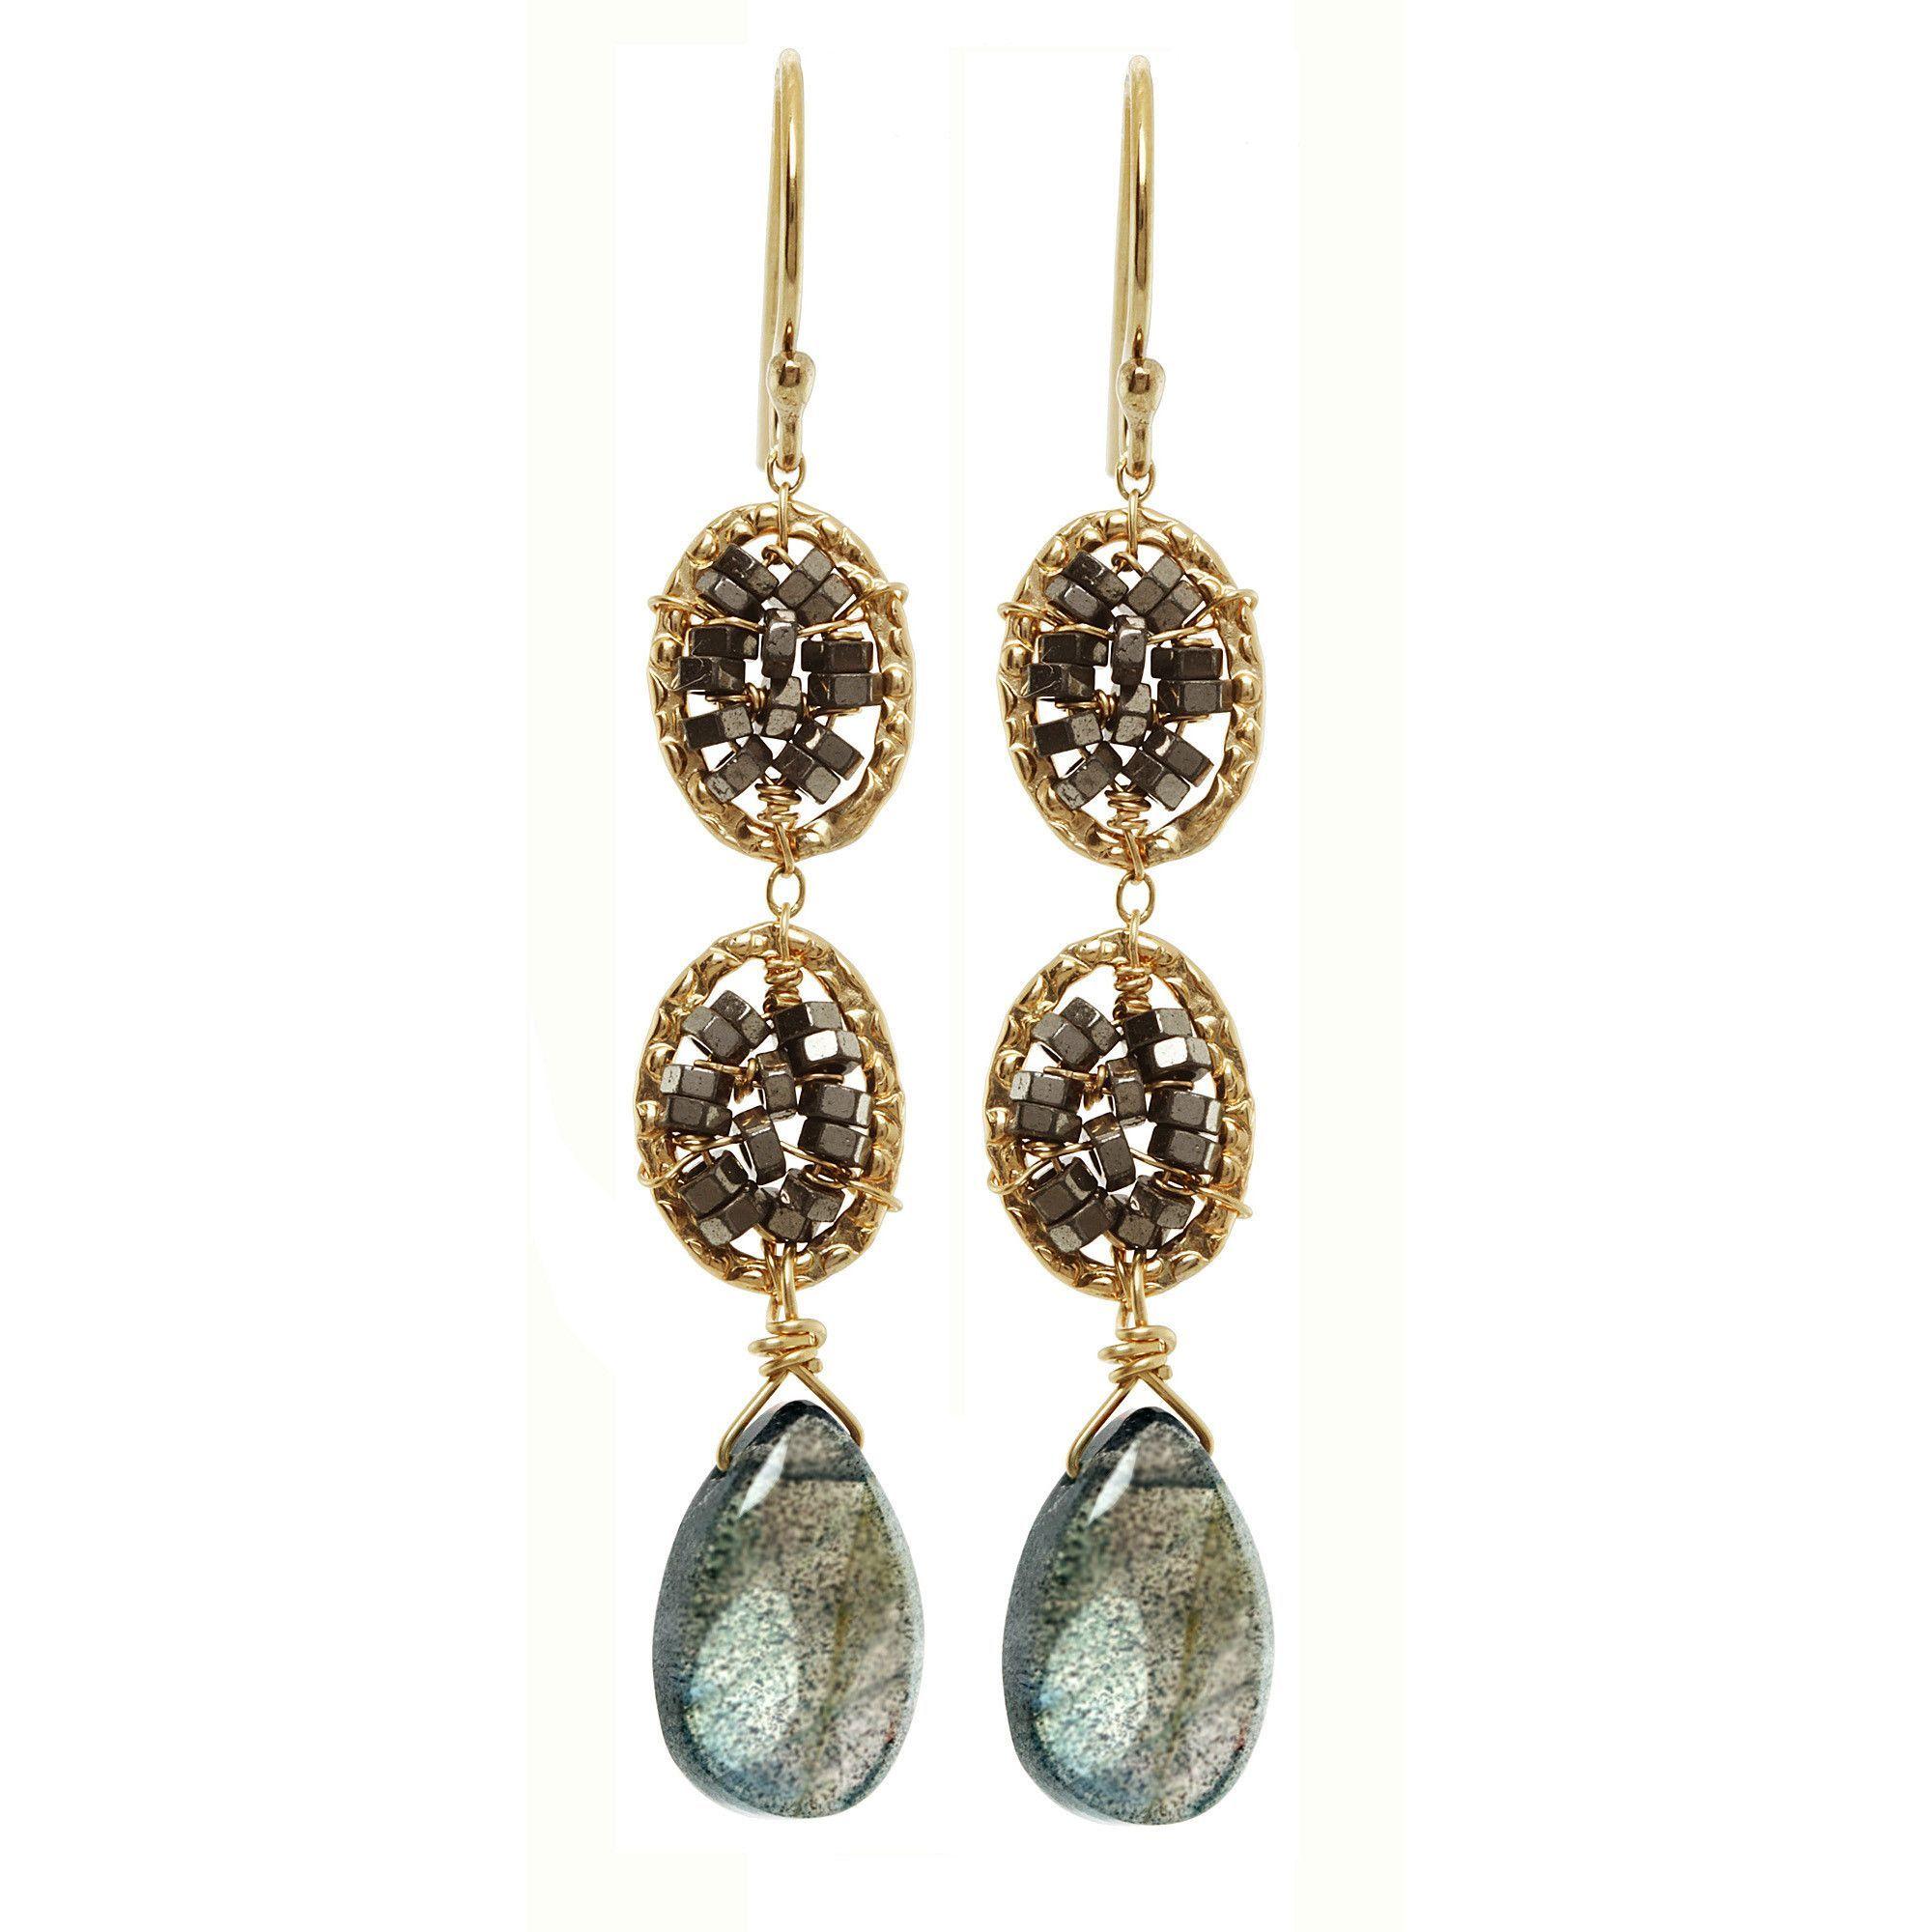 Michelle Pressler Earrings Hematite and Labradorite 3025 Artistic